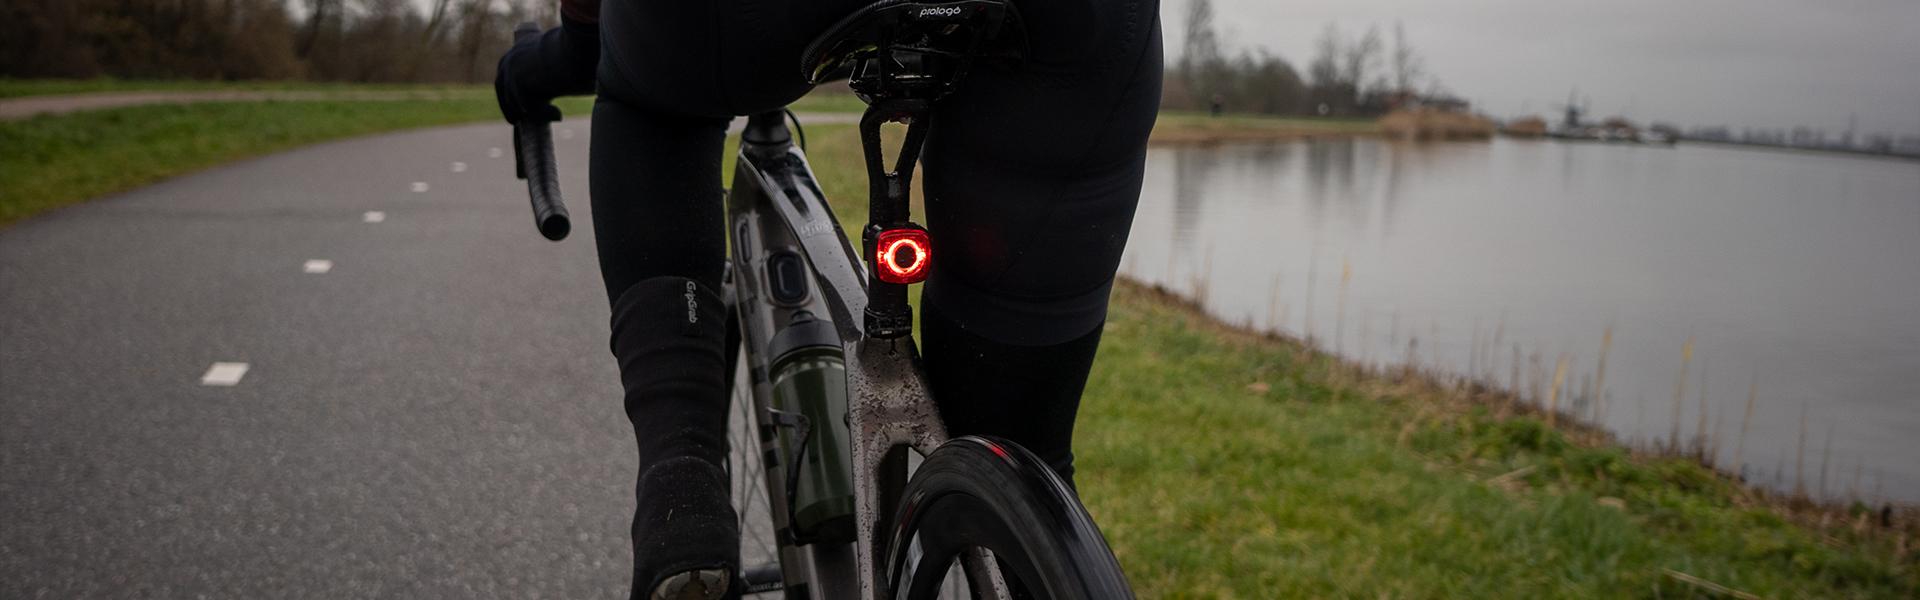 Sate-lite CREE 15lux ebike light eletric bike headlight front fork 6-48V